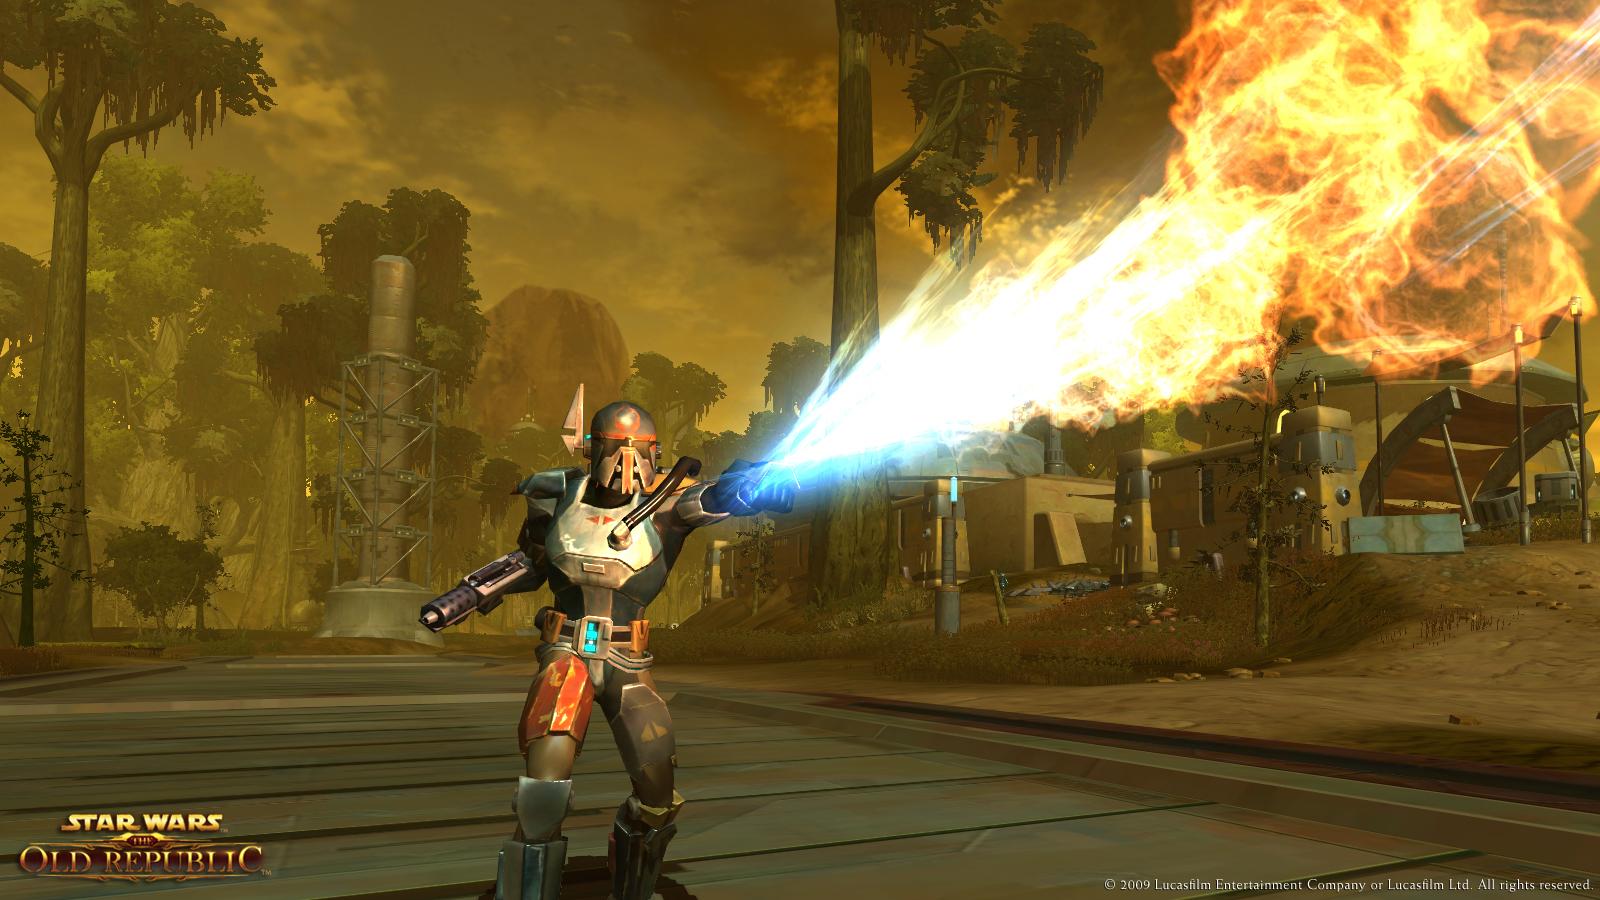 Flamethrower Star Wars The Old Republic Wiki Fandom